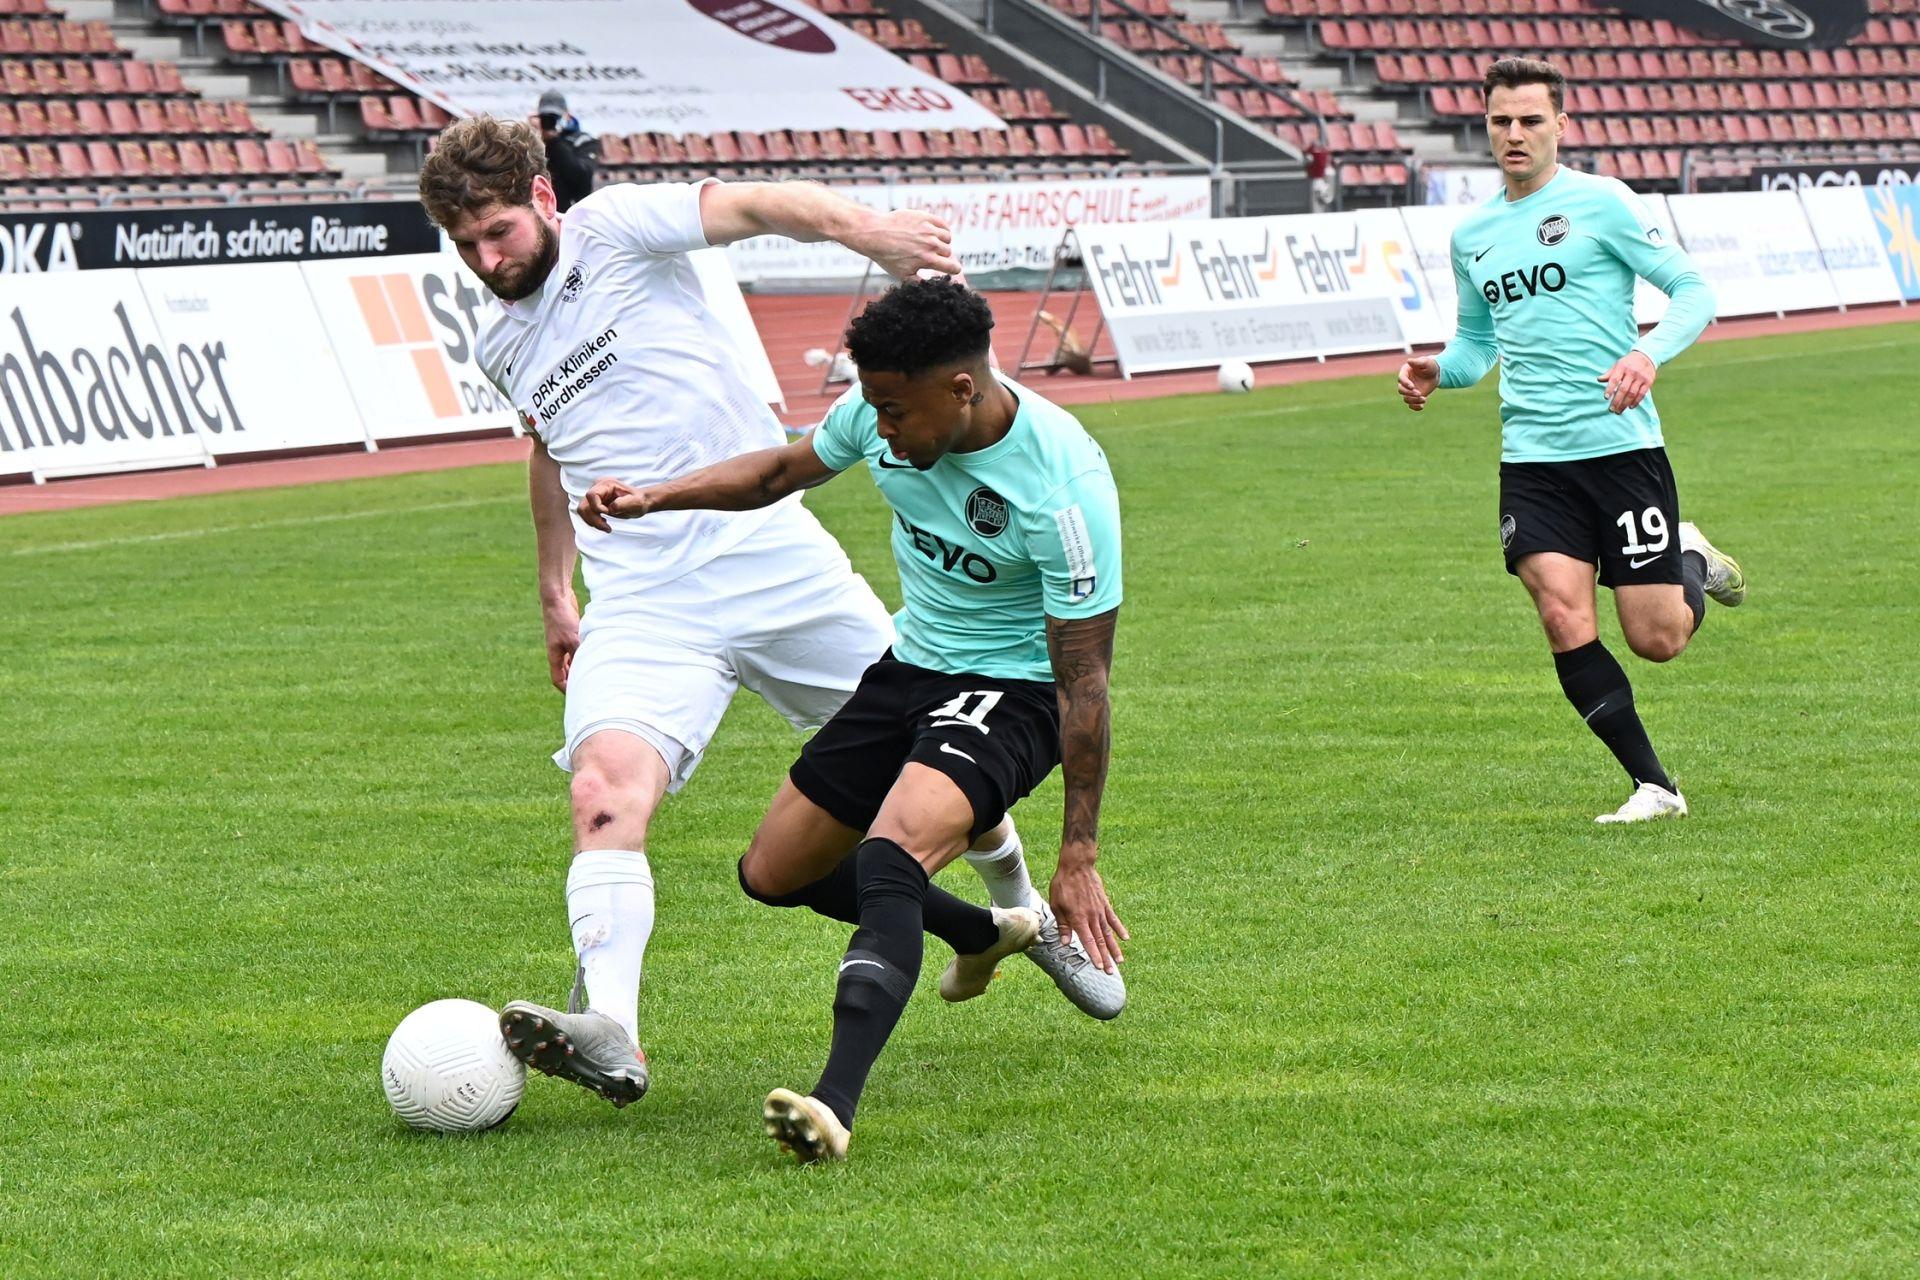 Regionalliga S�dwest 2020/21, KSV Hessen Kassel, Kickers Offenbach, Endstand 0:4